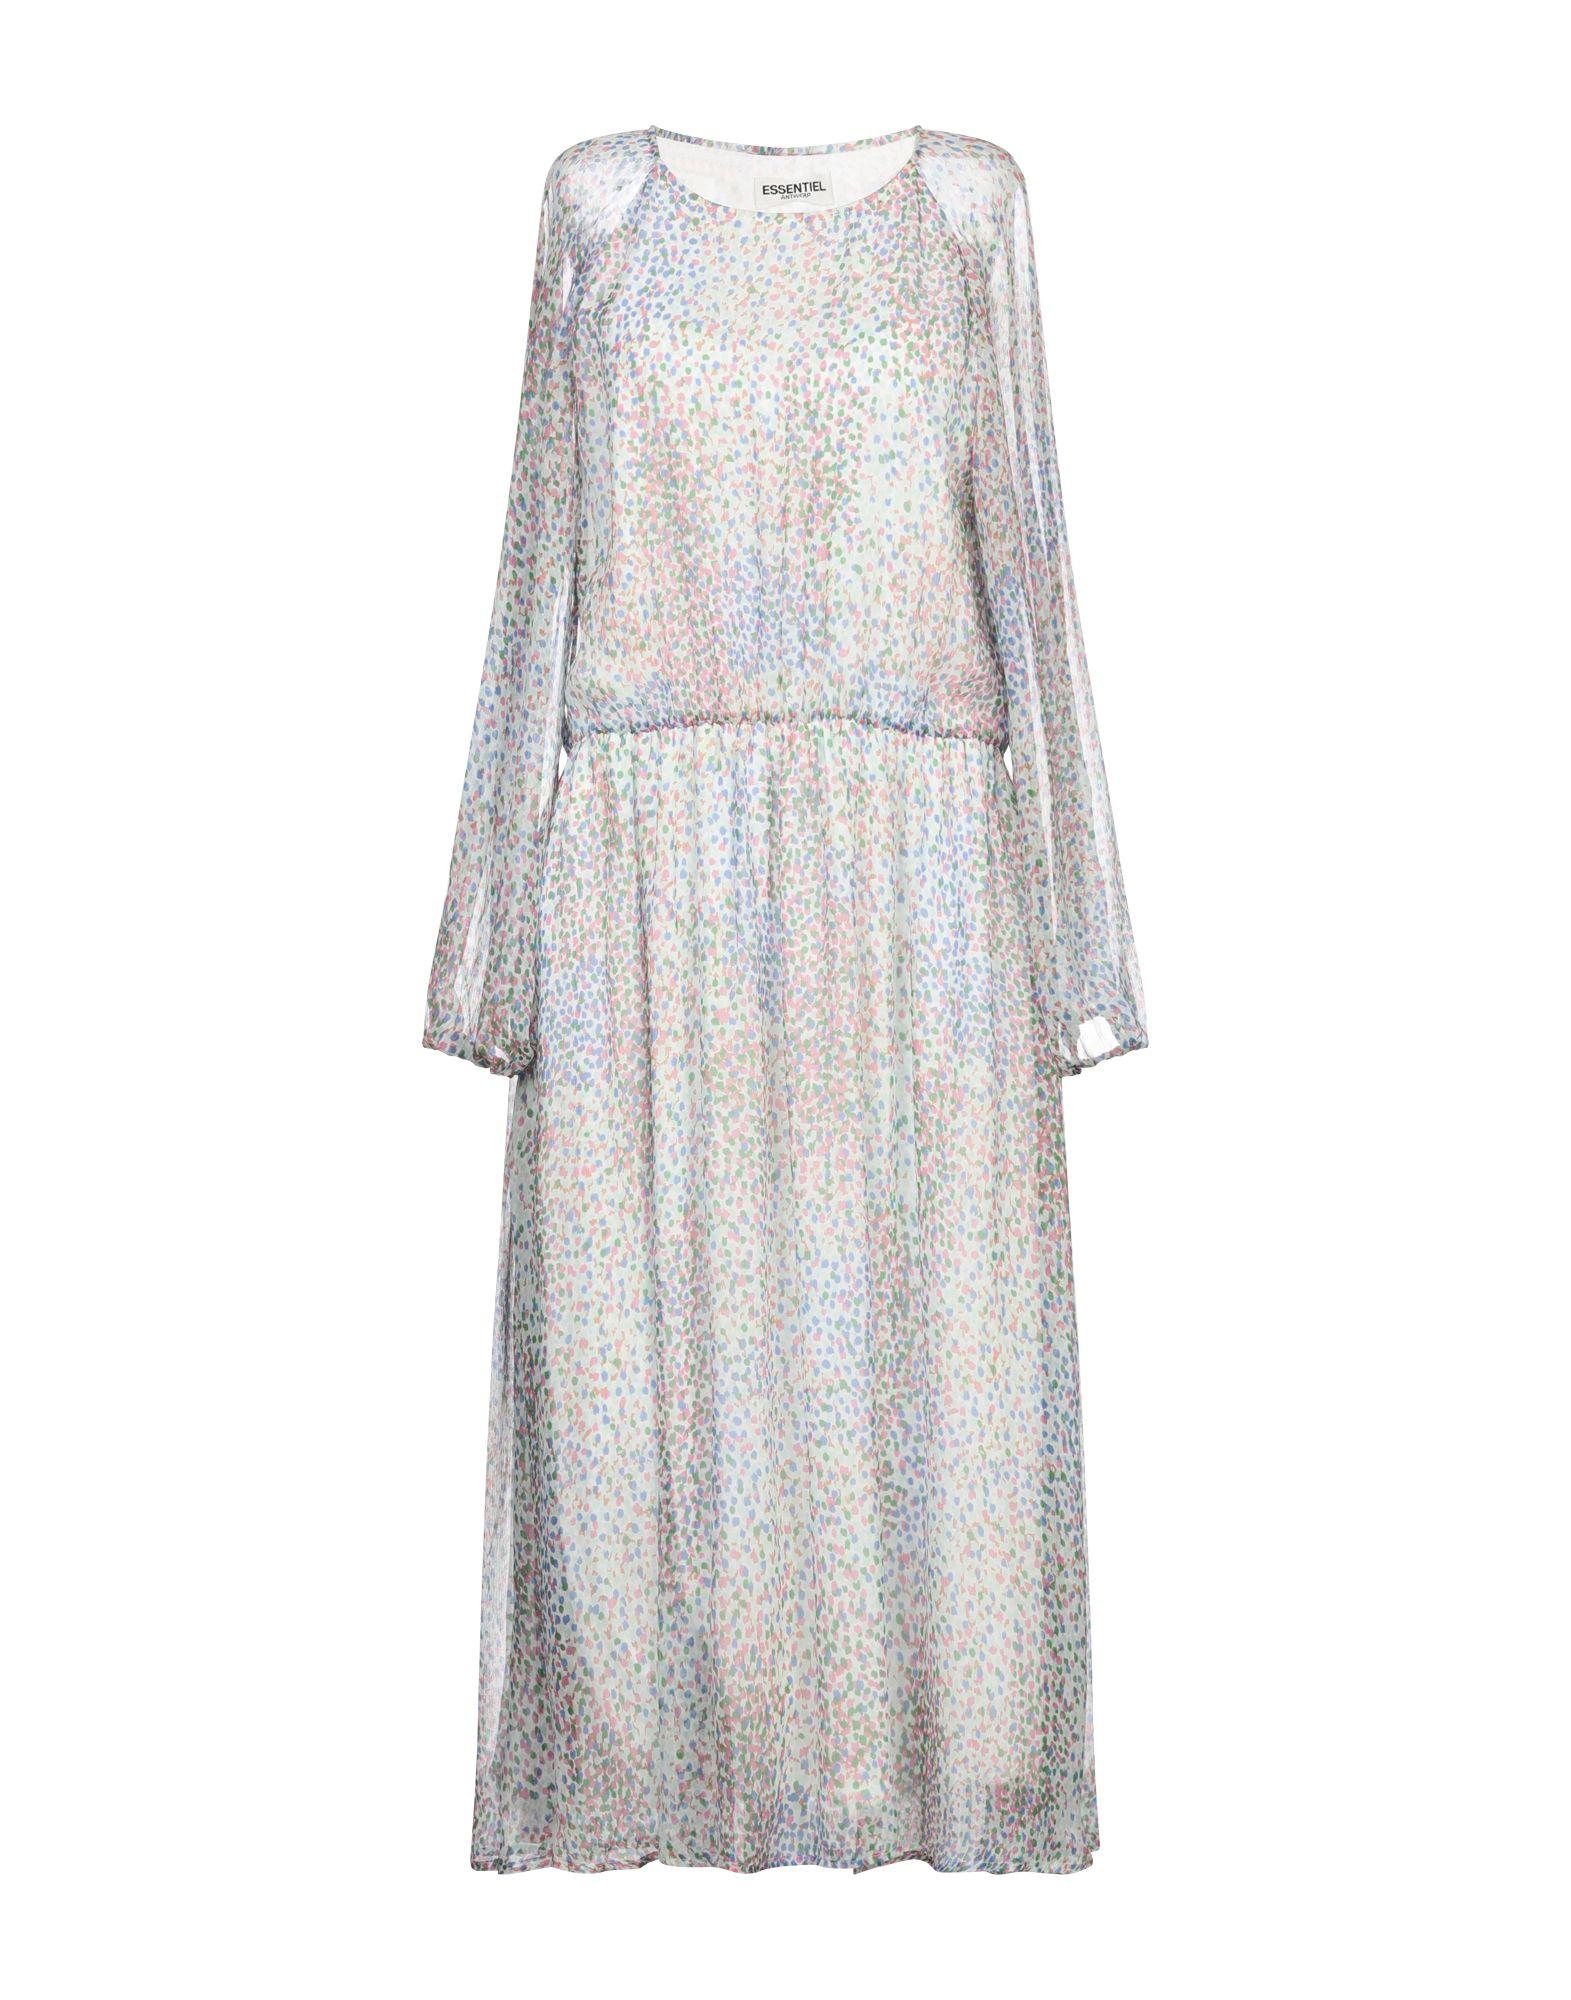 ESSENTIEL ANTWERP Платье длиной 3/4